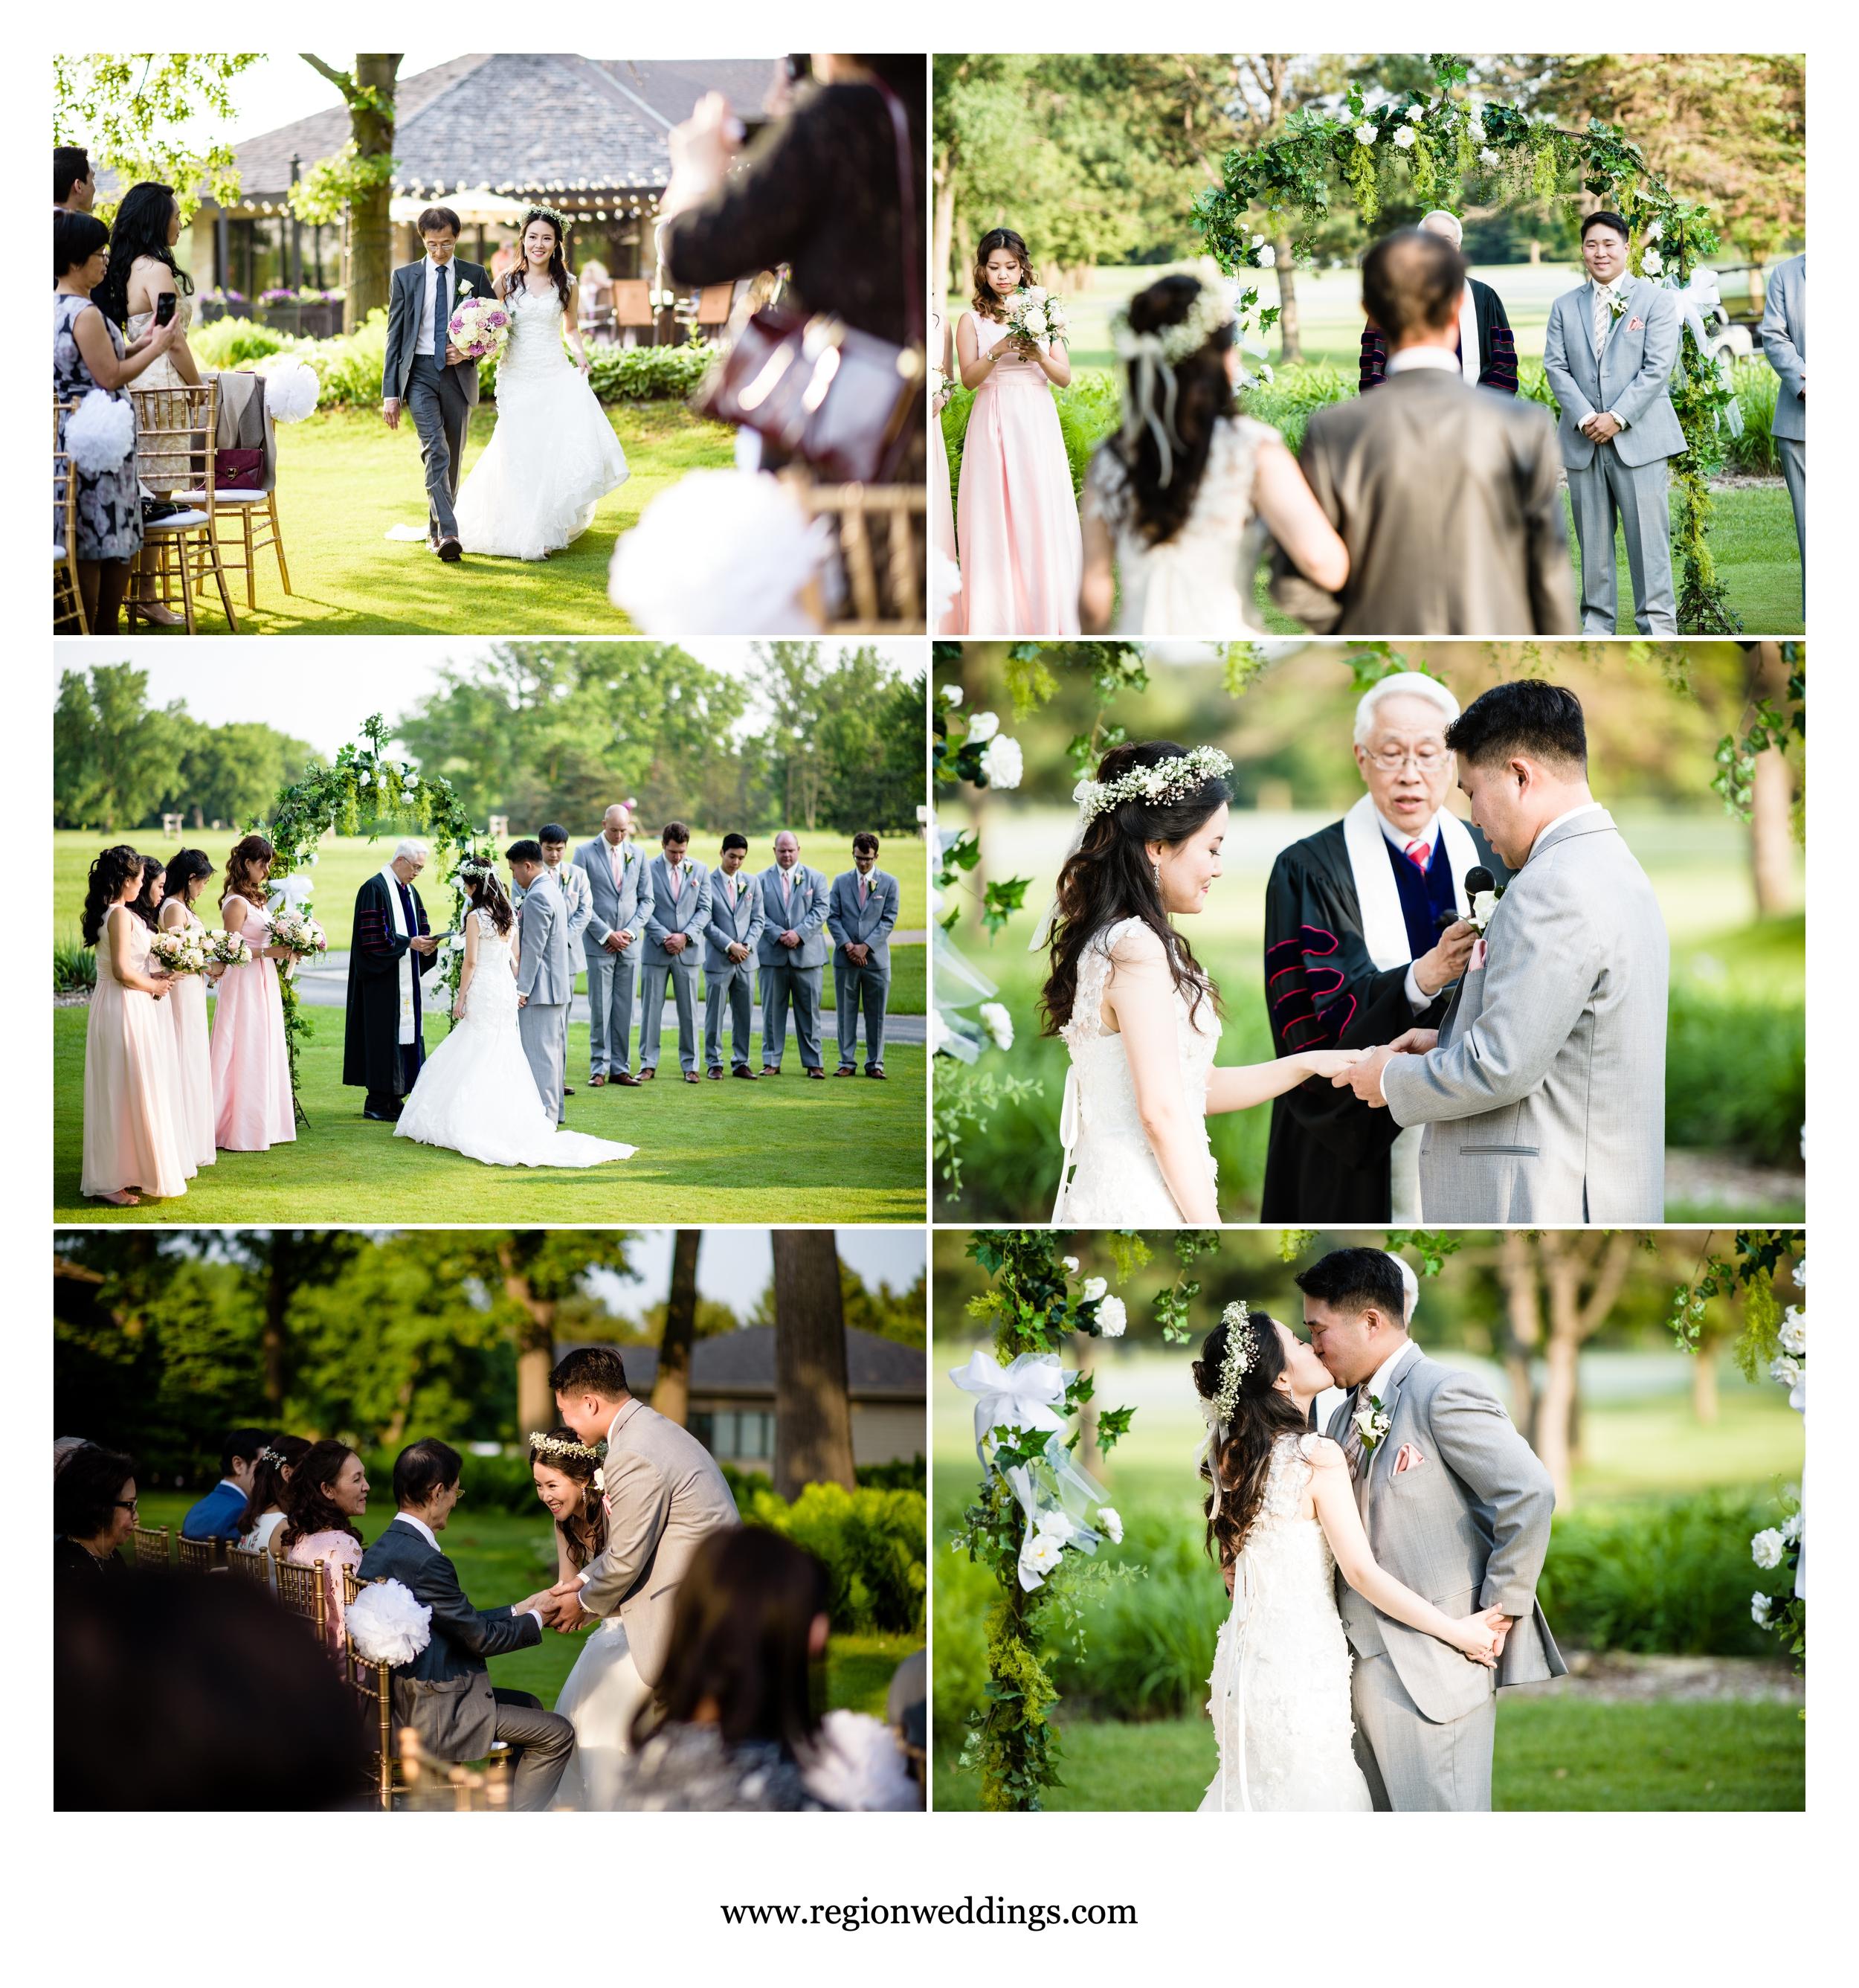 Golf course wedding ceremony at Briar Ridge.